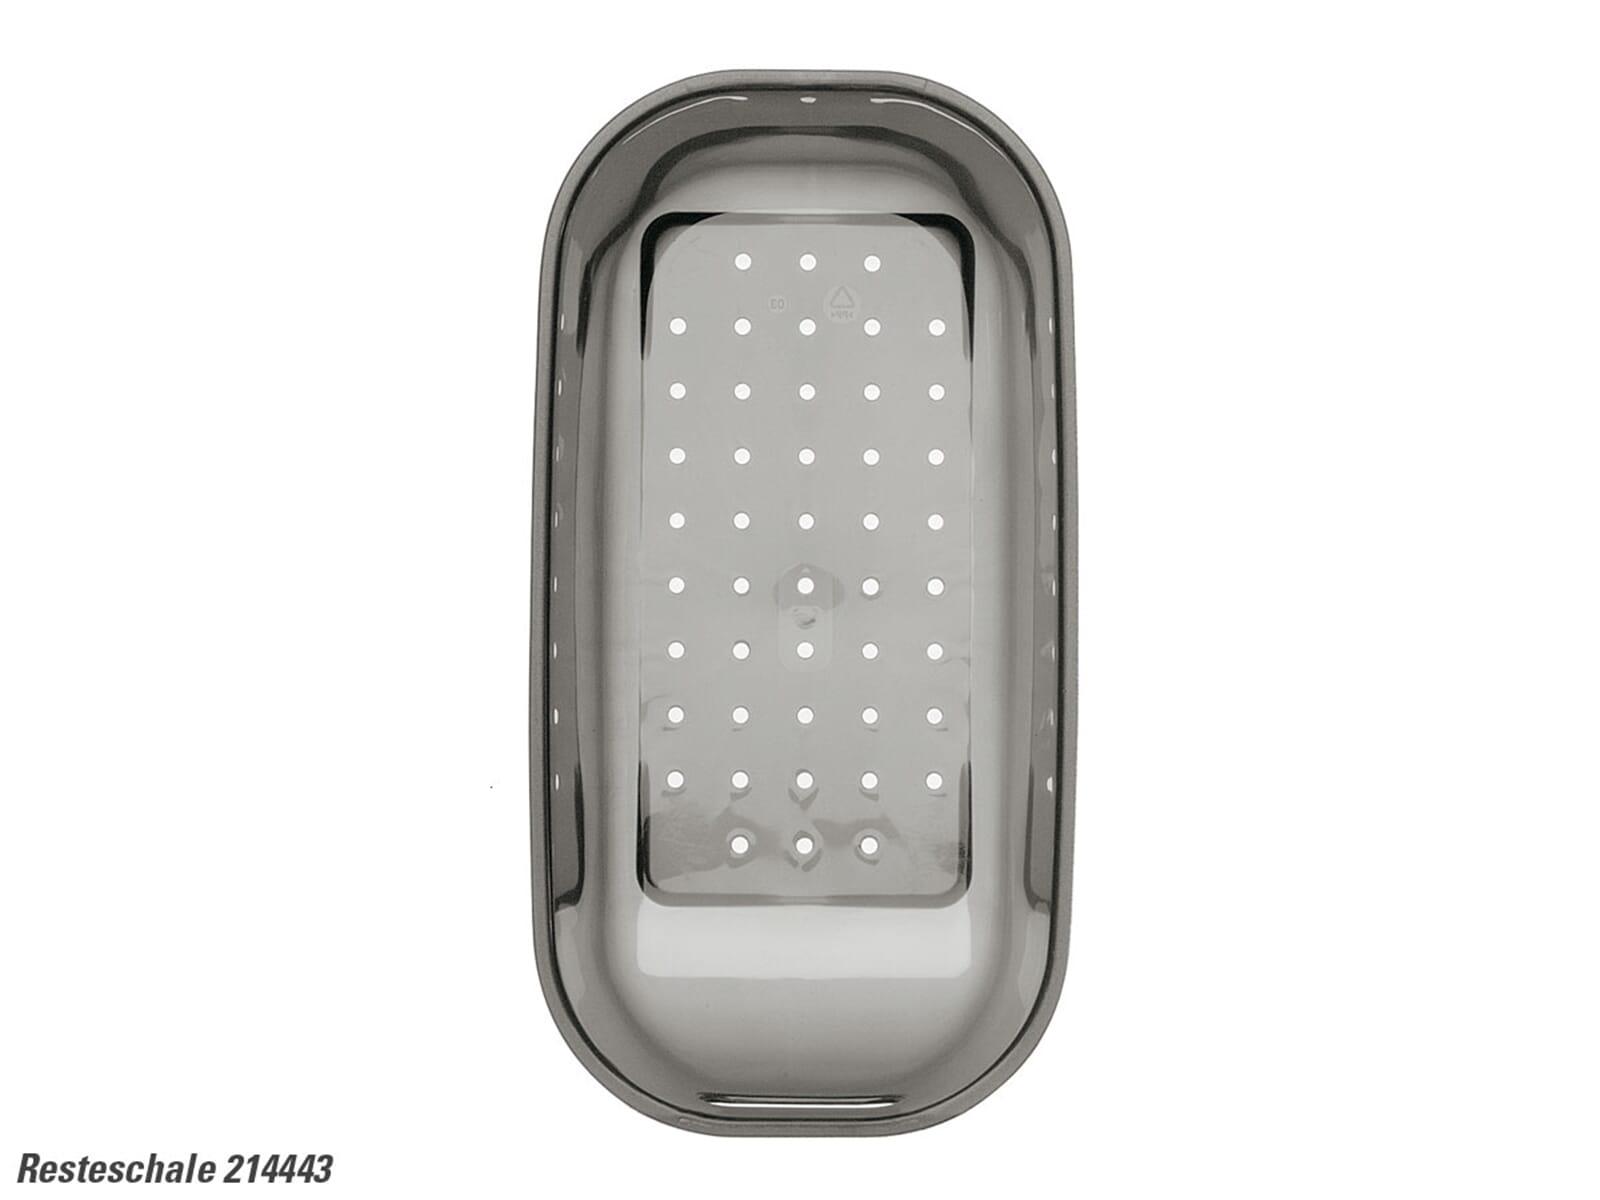 Blanco 214 443 Resteschale Kunststoff transparent grau